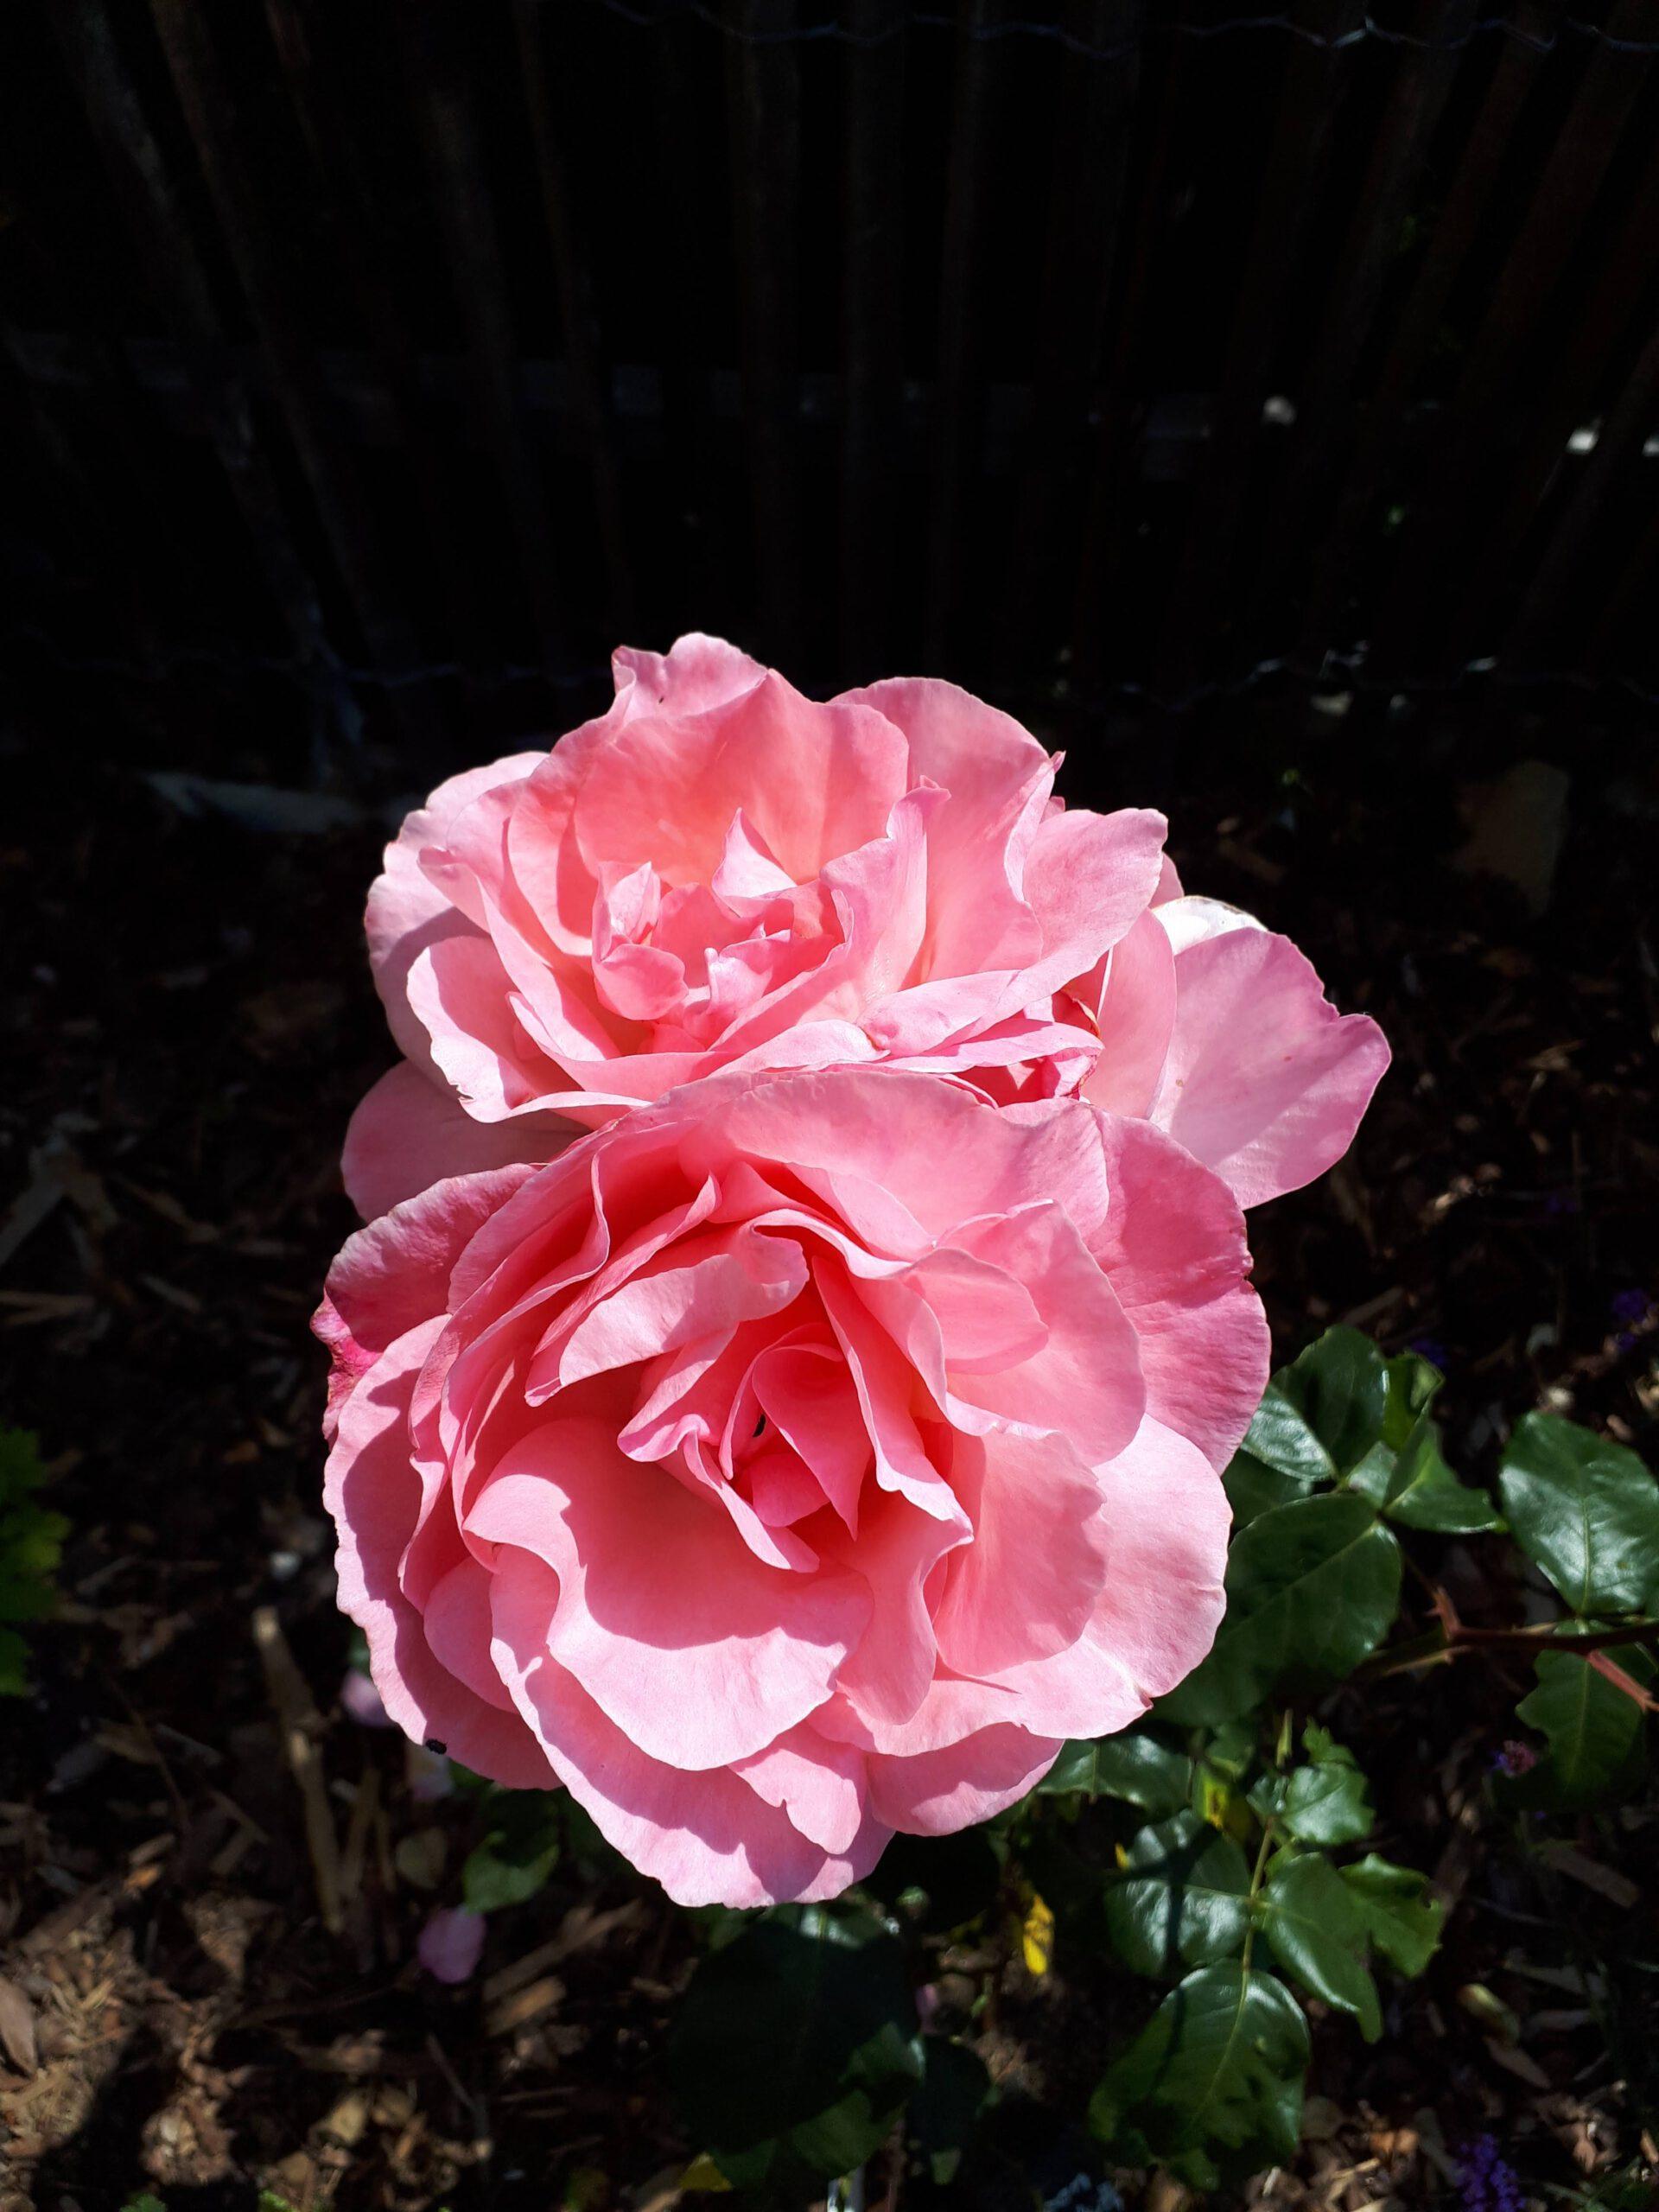 Meine Rosensorten, hier die Beetrose Queen Elizabeth.